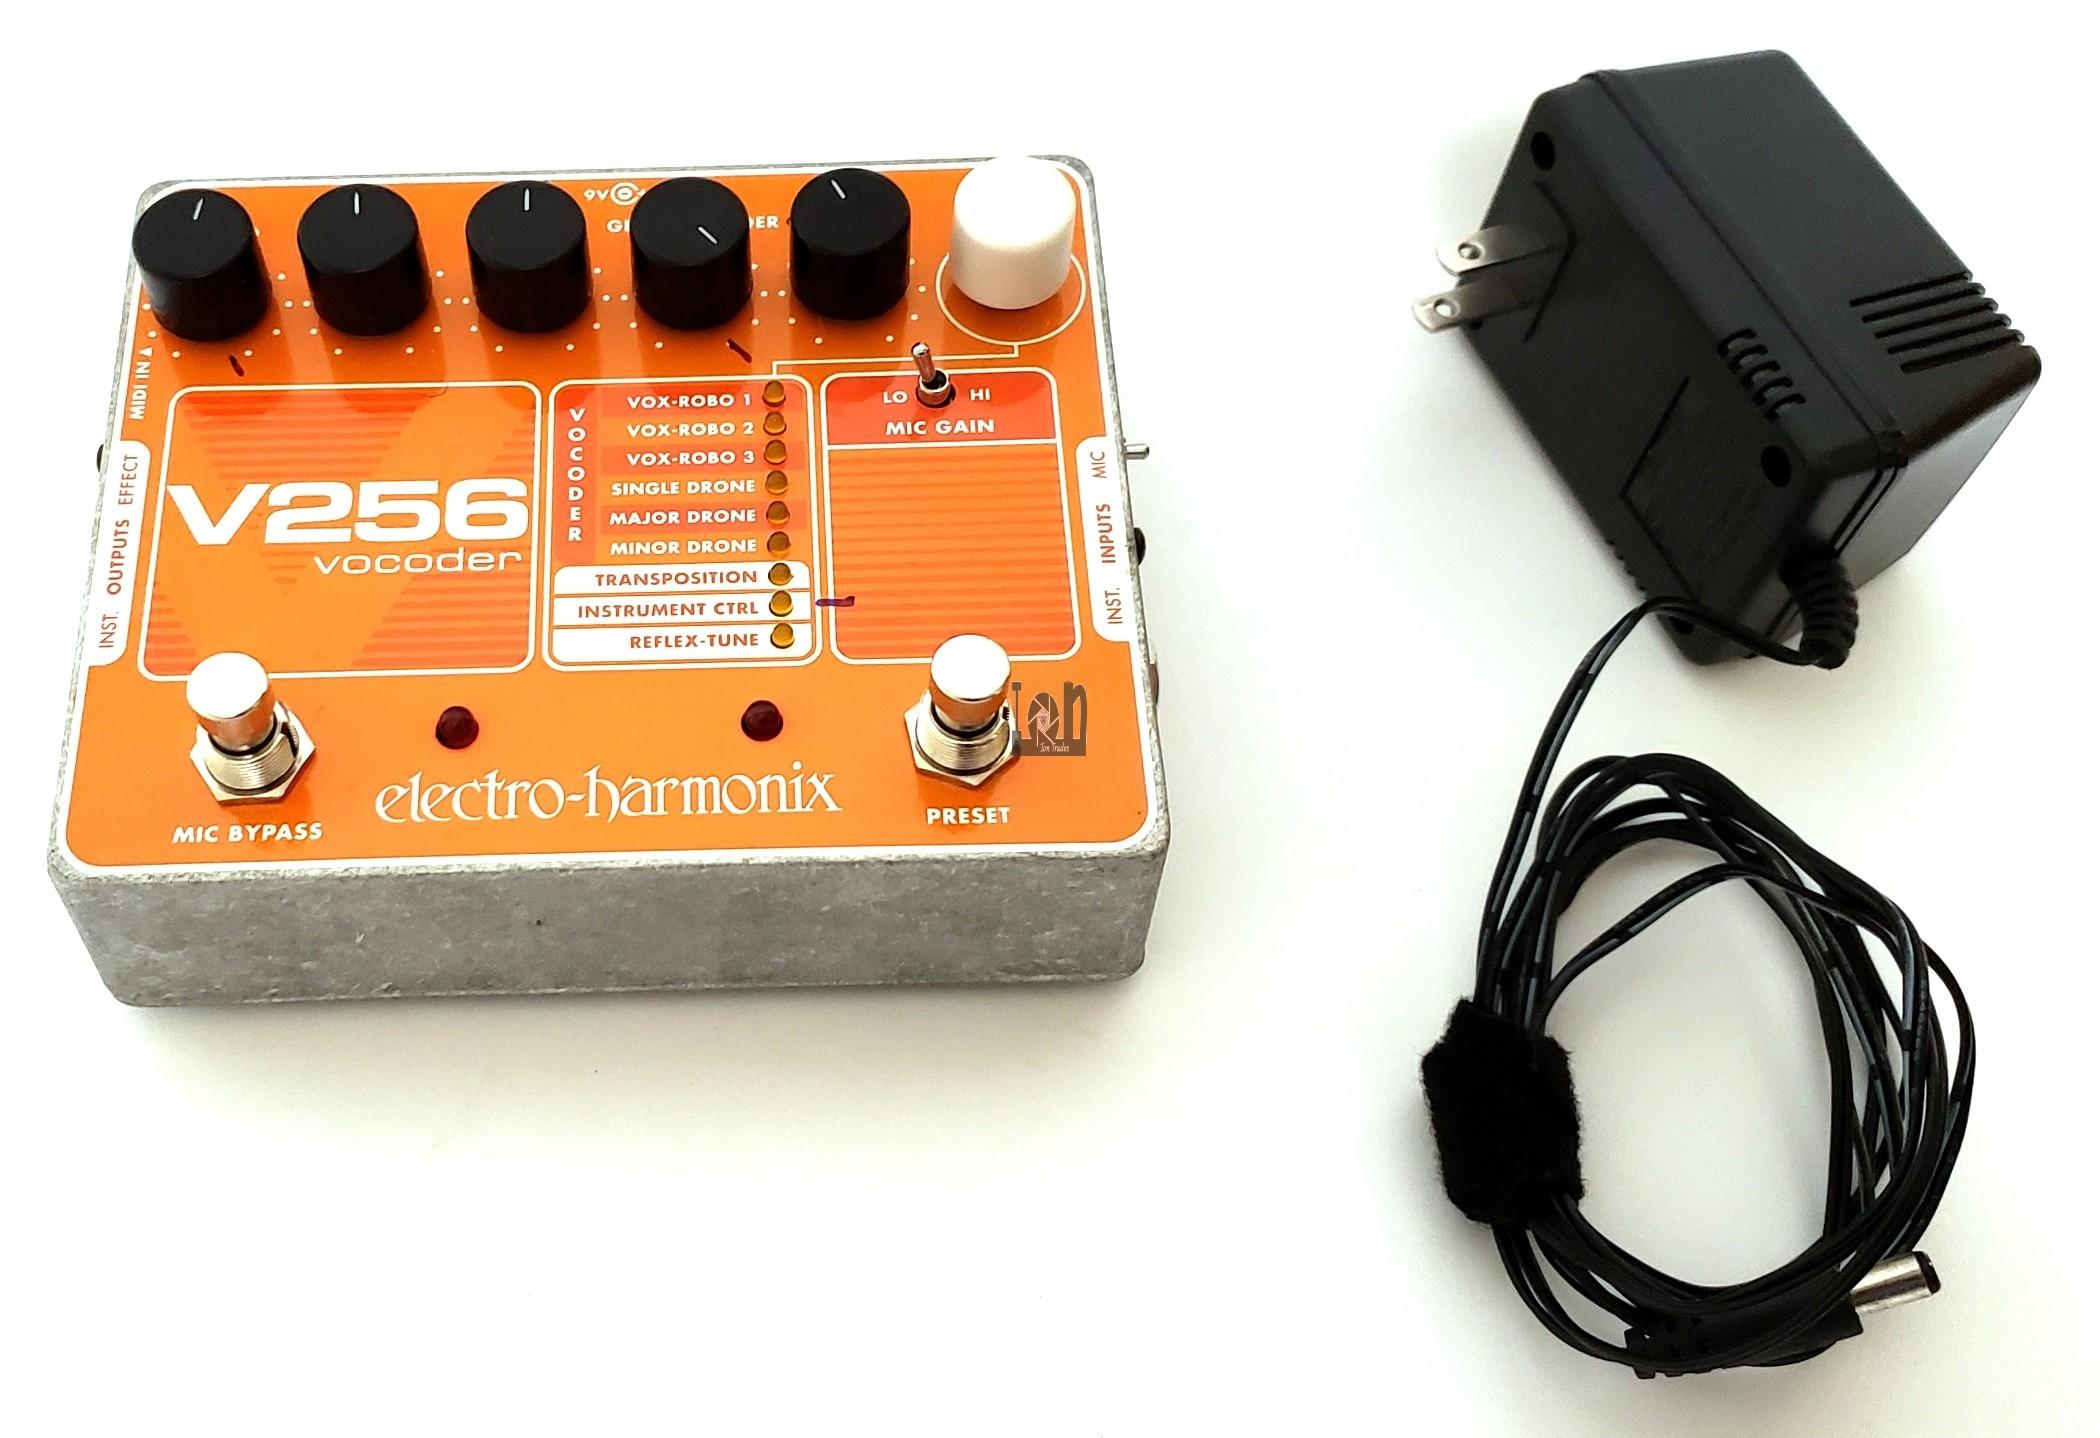 Electro-Harmonix V256 Vocoder with Reflex Tune Guitar Effect Pedal